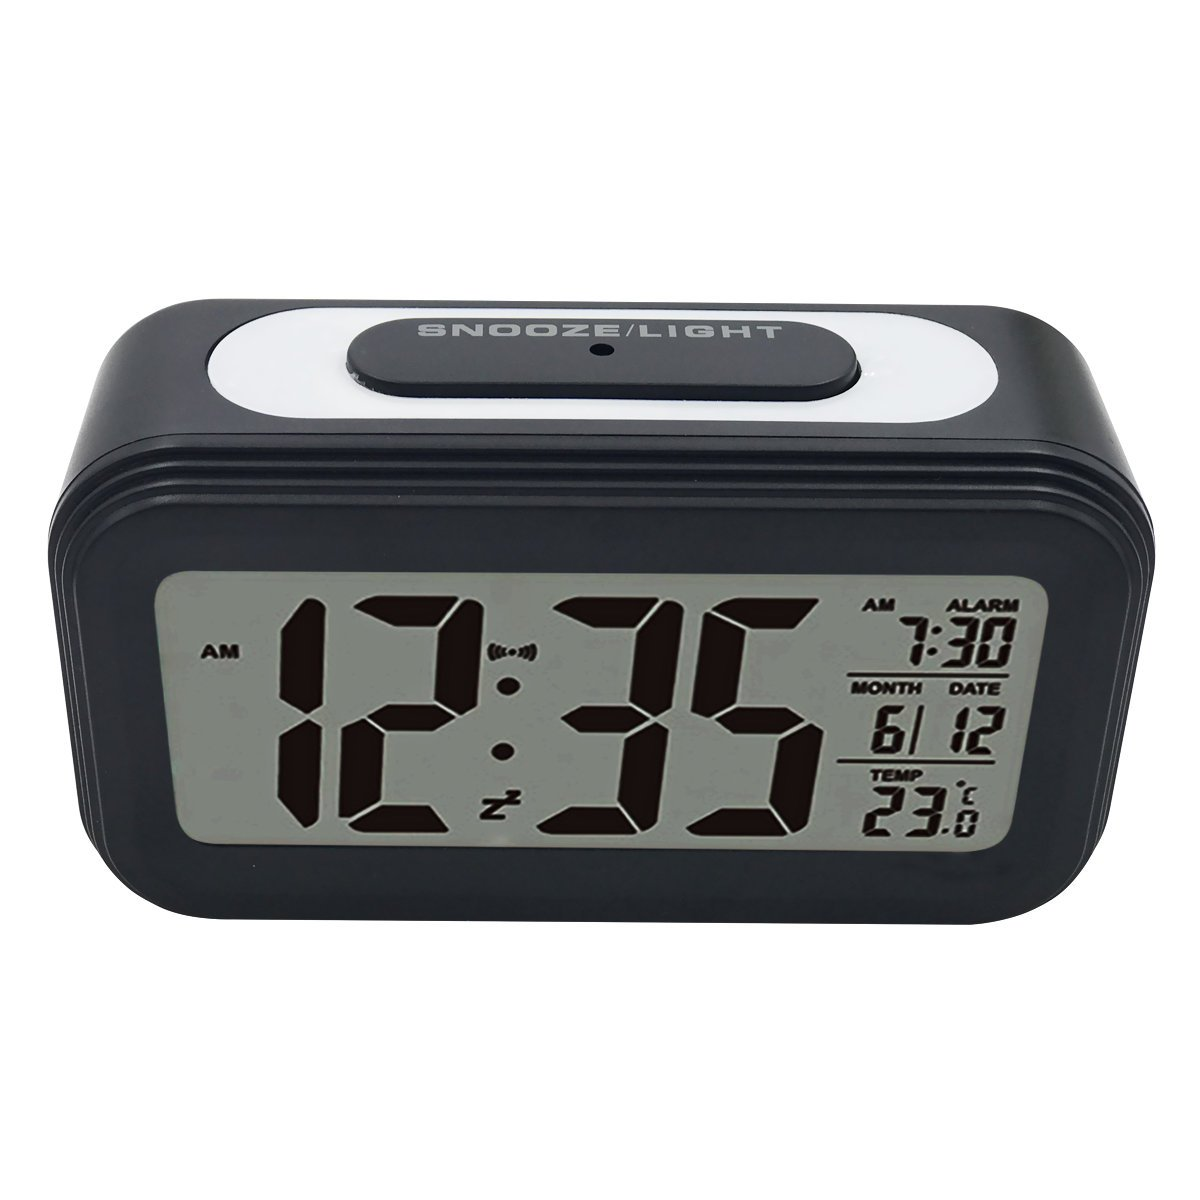 EASEHOME Reloj Despertador Digital, Relojes Despertadores Digitales Alarma Despertador Silencioso con Calendario Temperatura Reloj Alarma Función Snooze Luz ...